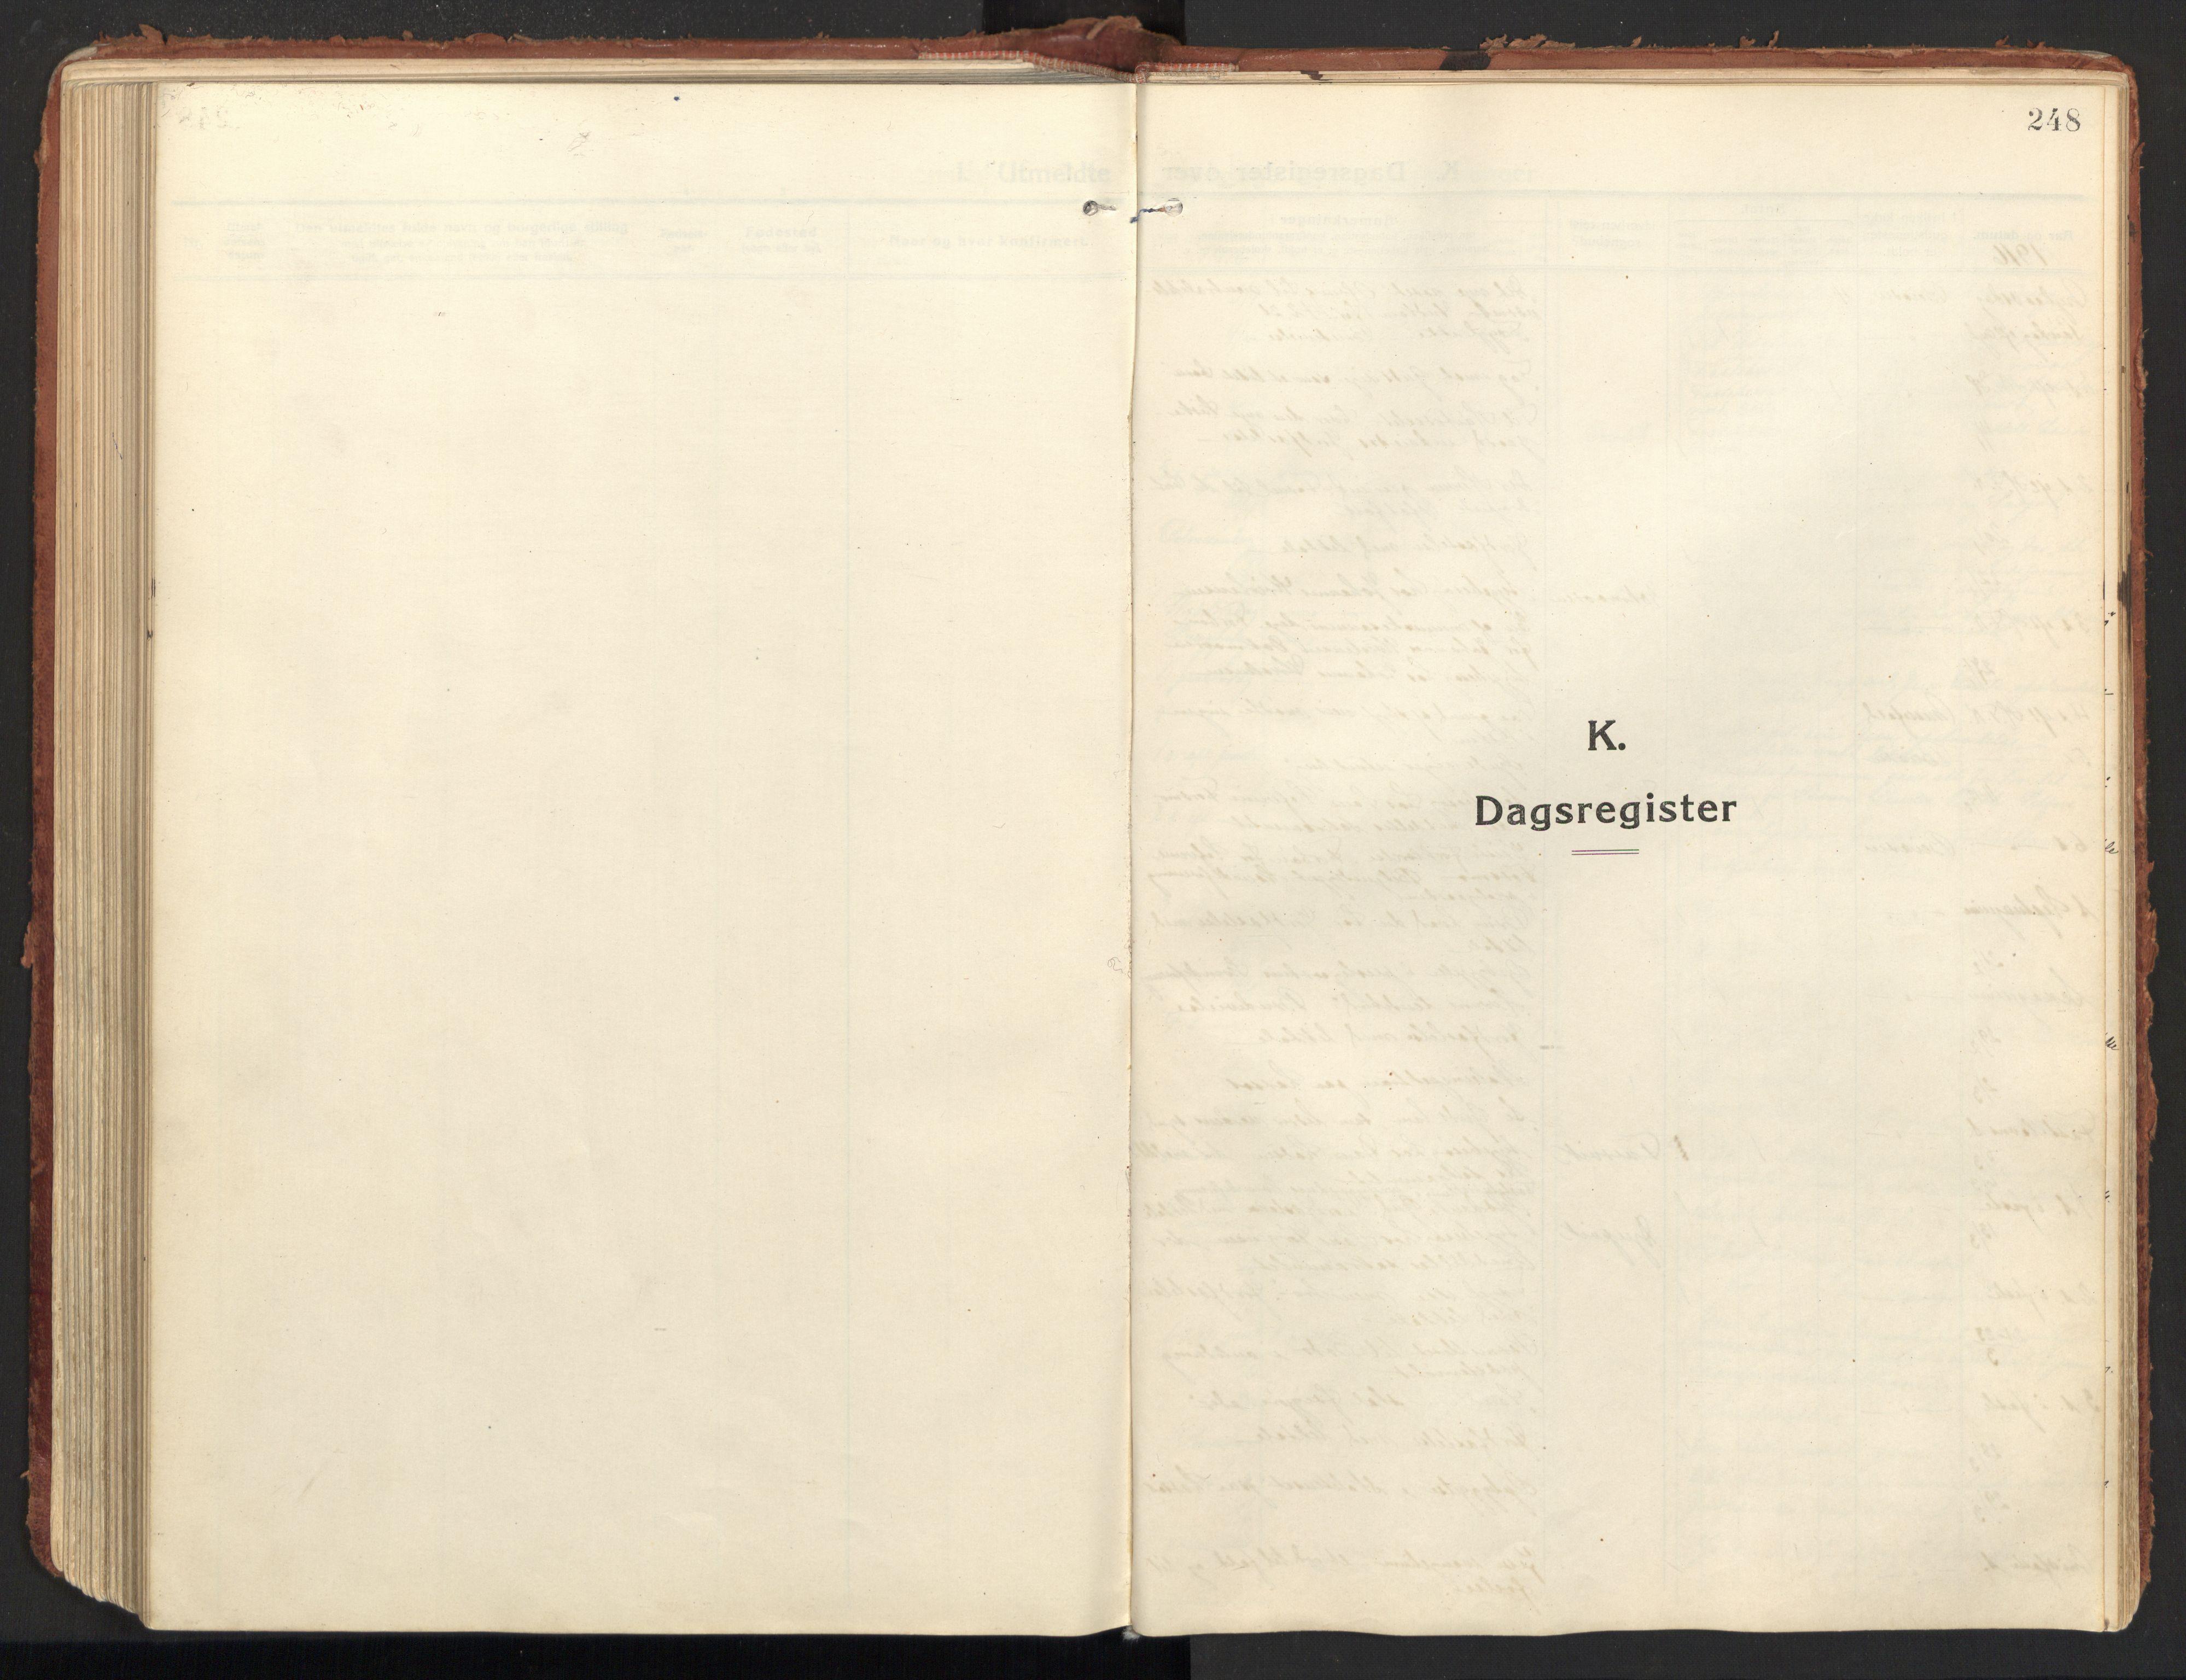 SAT, Ministerialprotokoller, klokkerbøker og fødselsregistre - Nordland, 846/L0650: Ministerialbok nr. 846A08, 1916-1935, s. 248